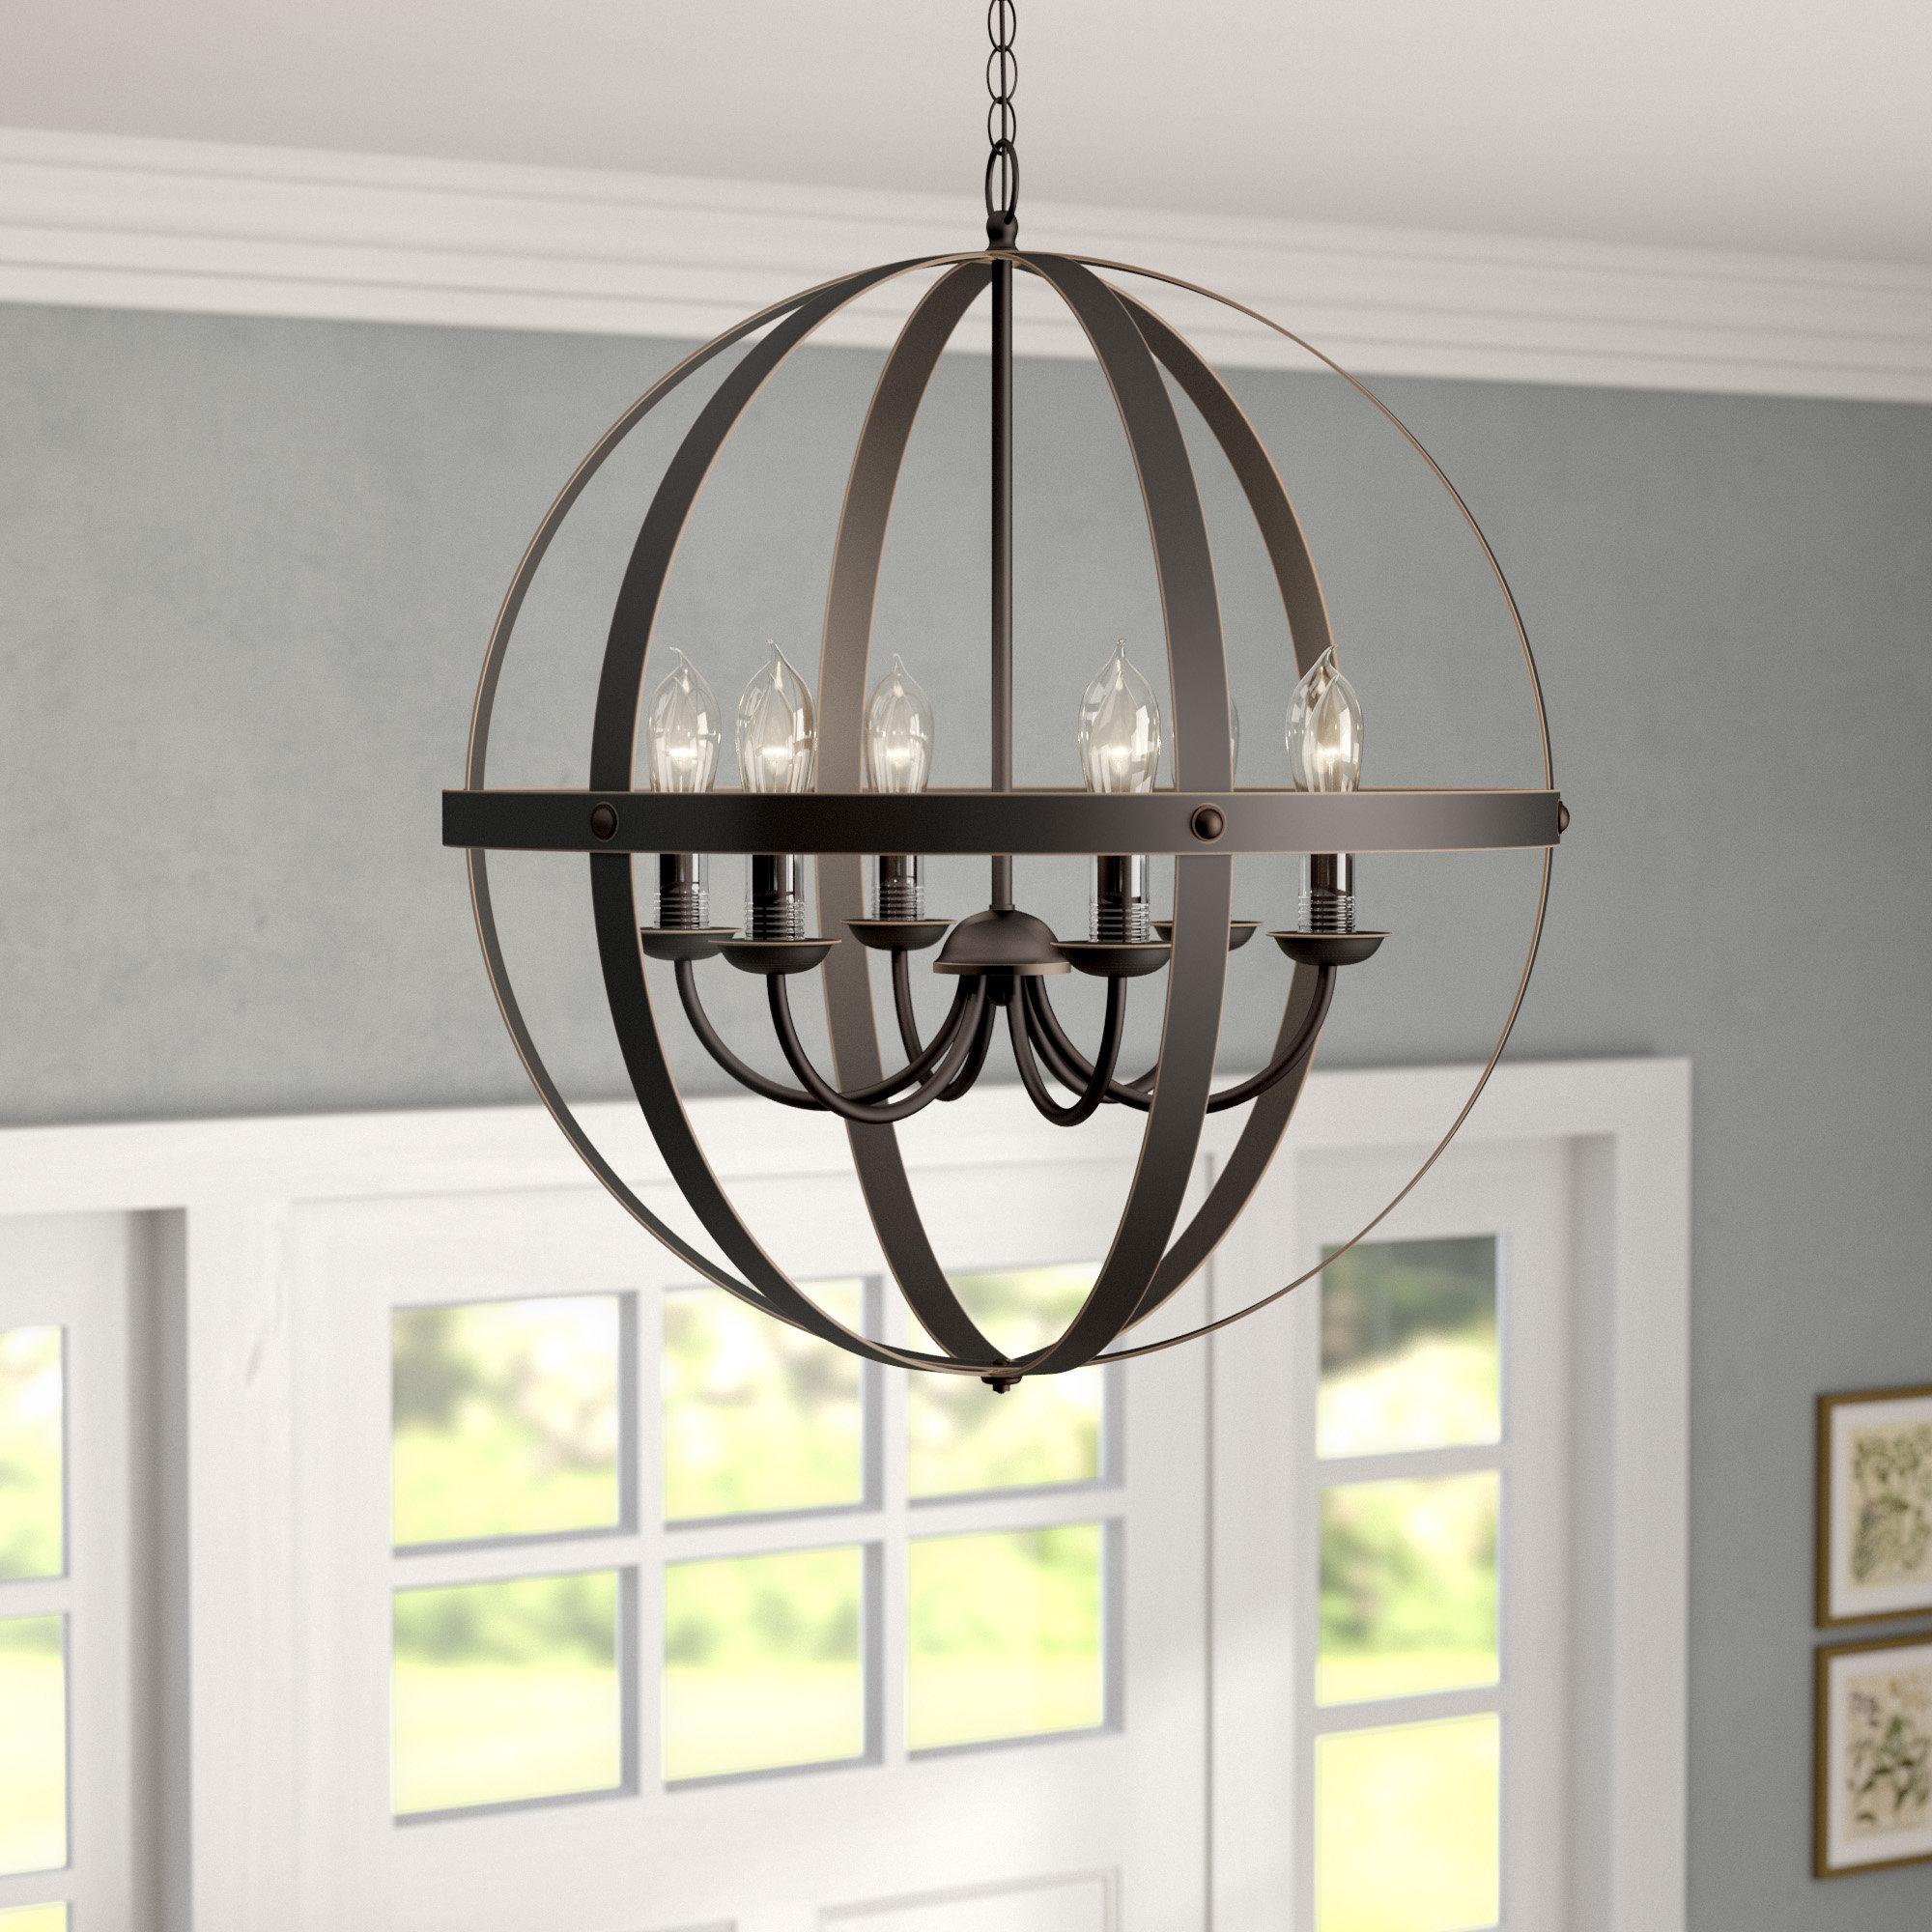 Genna 6 Light Globe Chandelier Intended For Well Known Donna 6 Light Globe Chandeliers (Gallery 8 of 20)